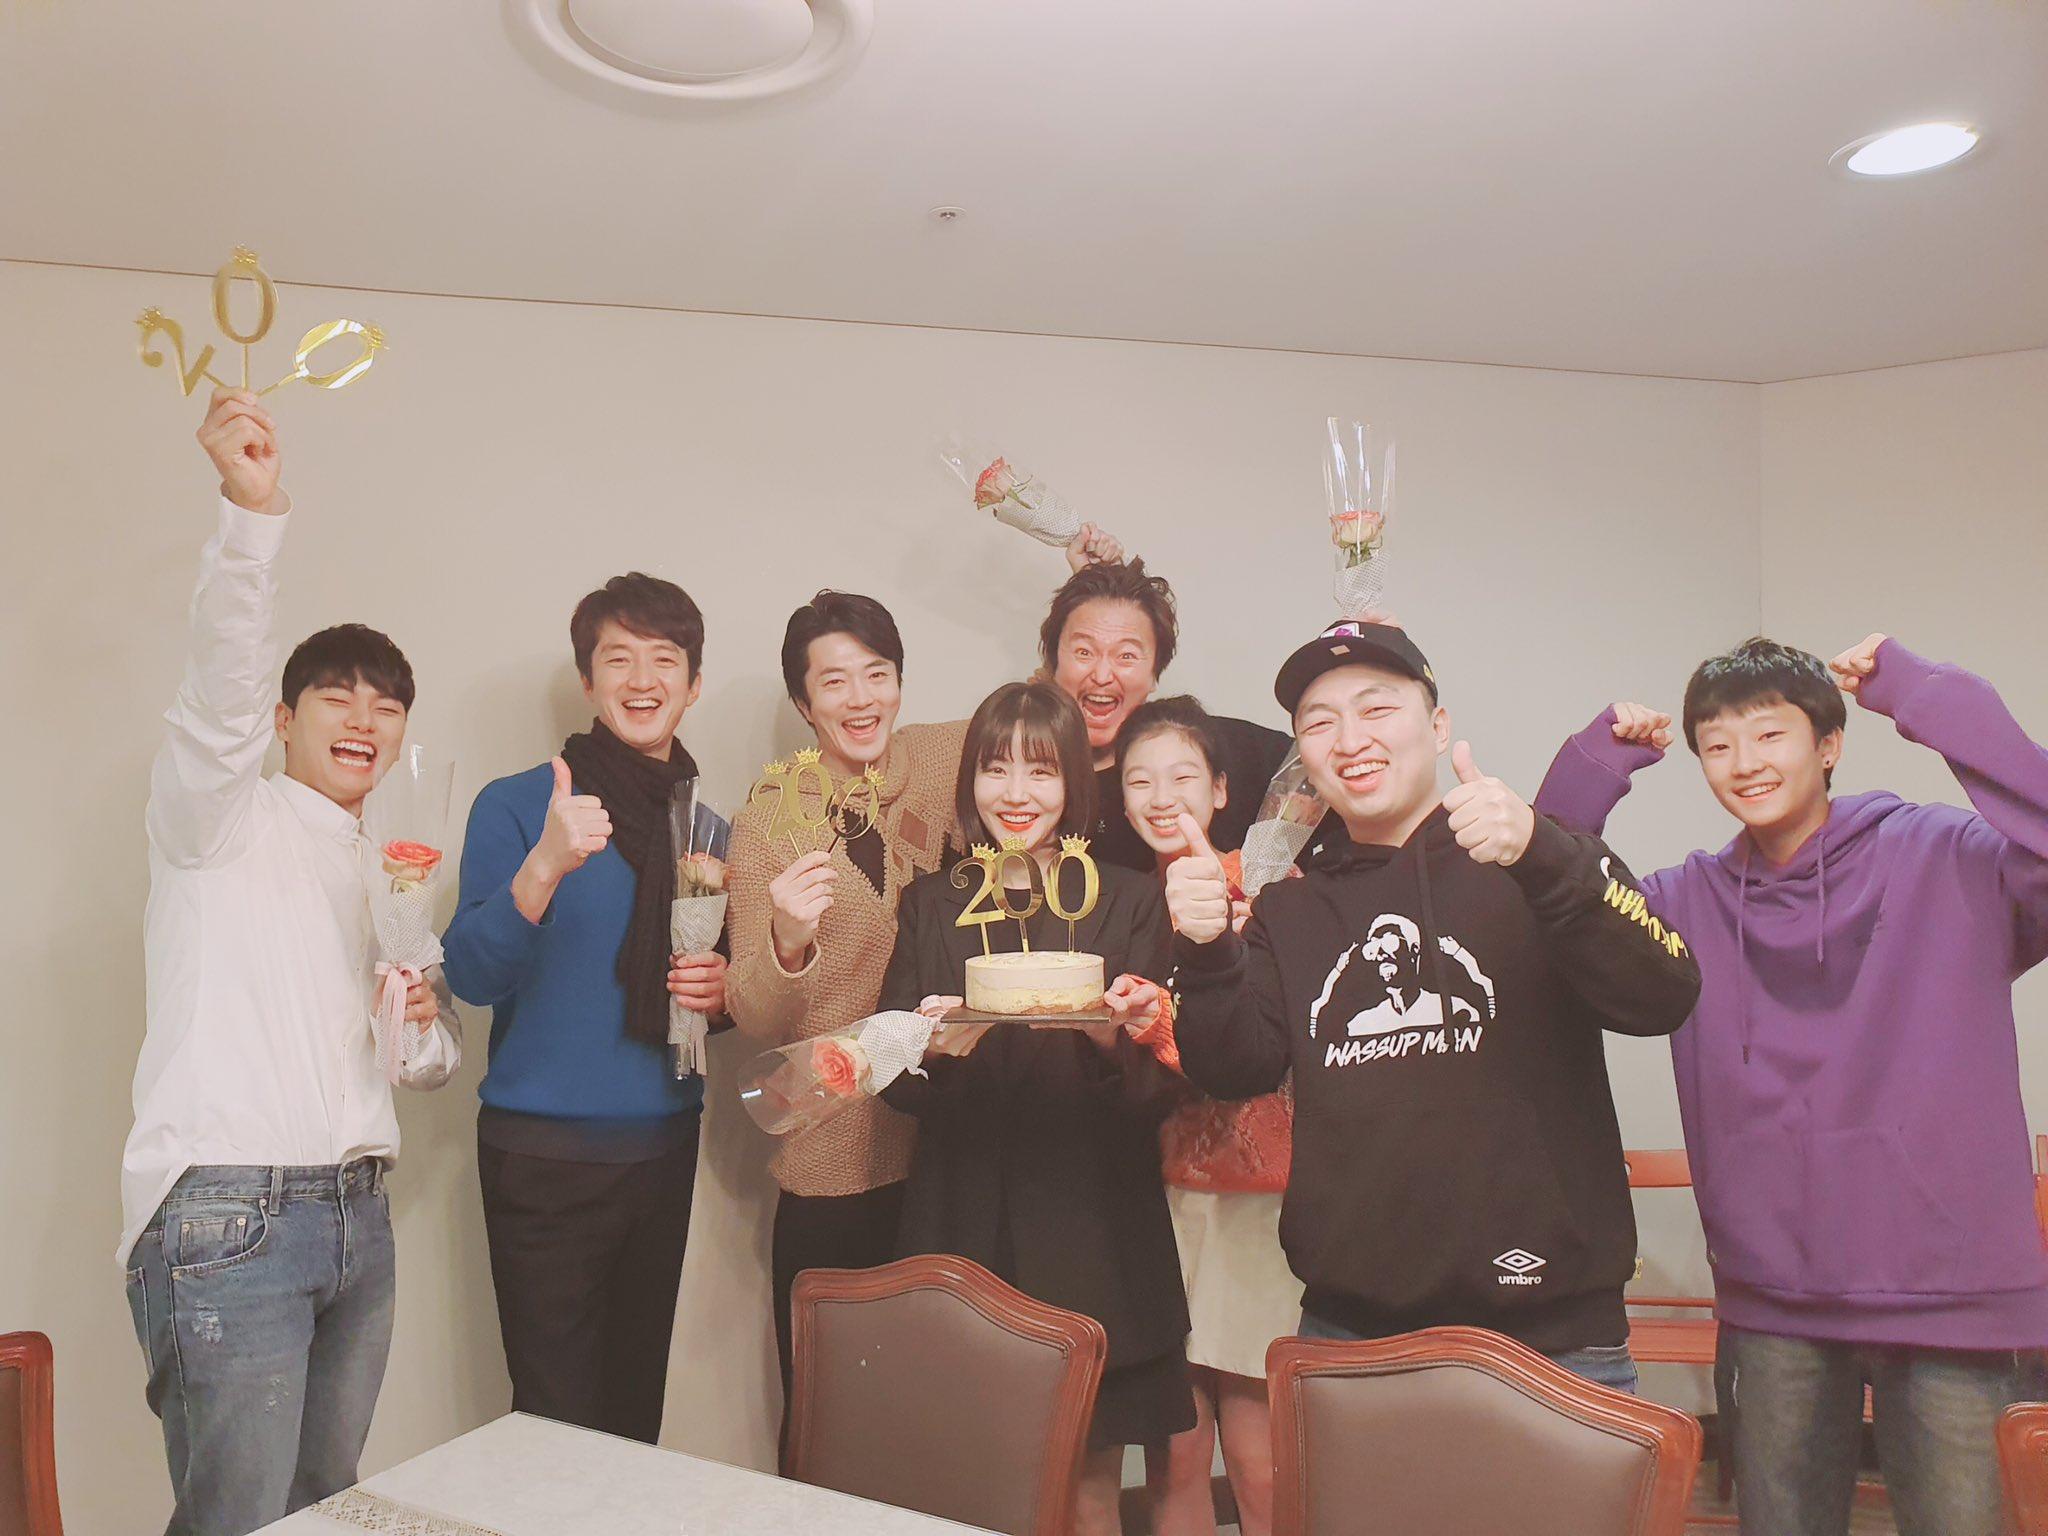 Sutradara dan pemeran Hitman: Agent Jun merayakan filmnya ditonton 2 juta orang.